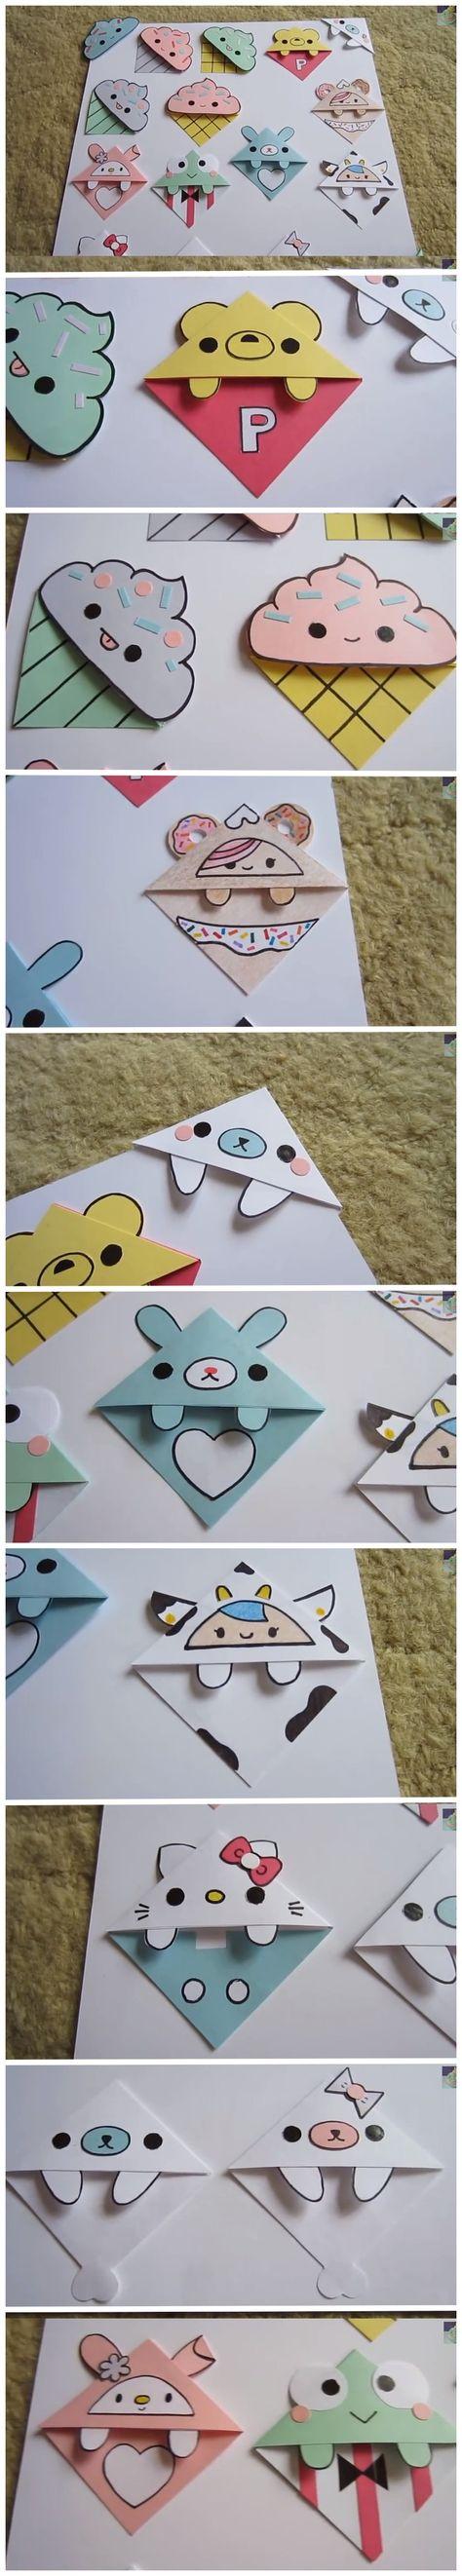 Corner Bookmark Collection (idea) | For more DIY paper craft ideas, visit our Pinterest Board: www.pinterest.com...